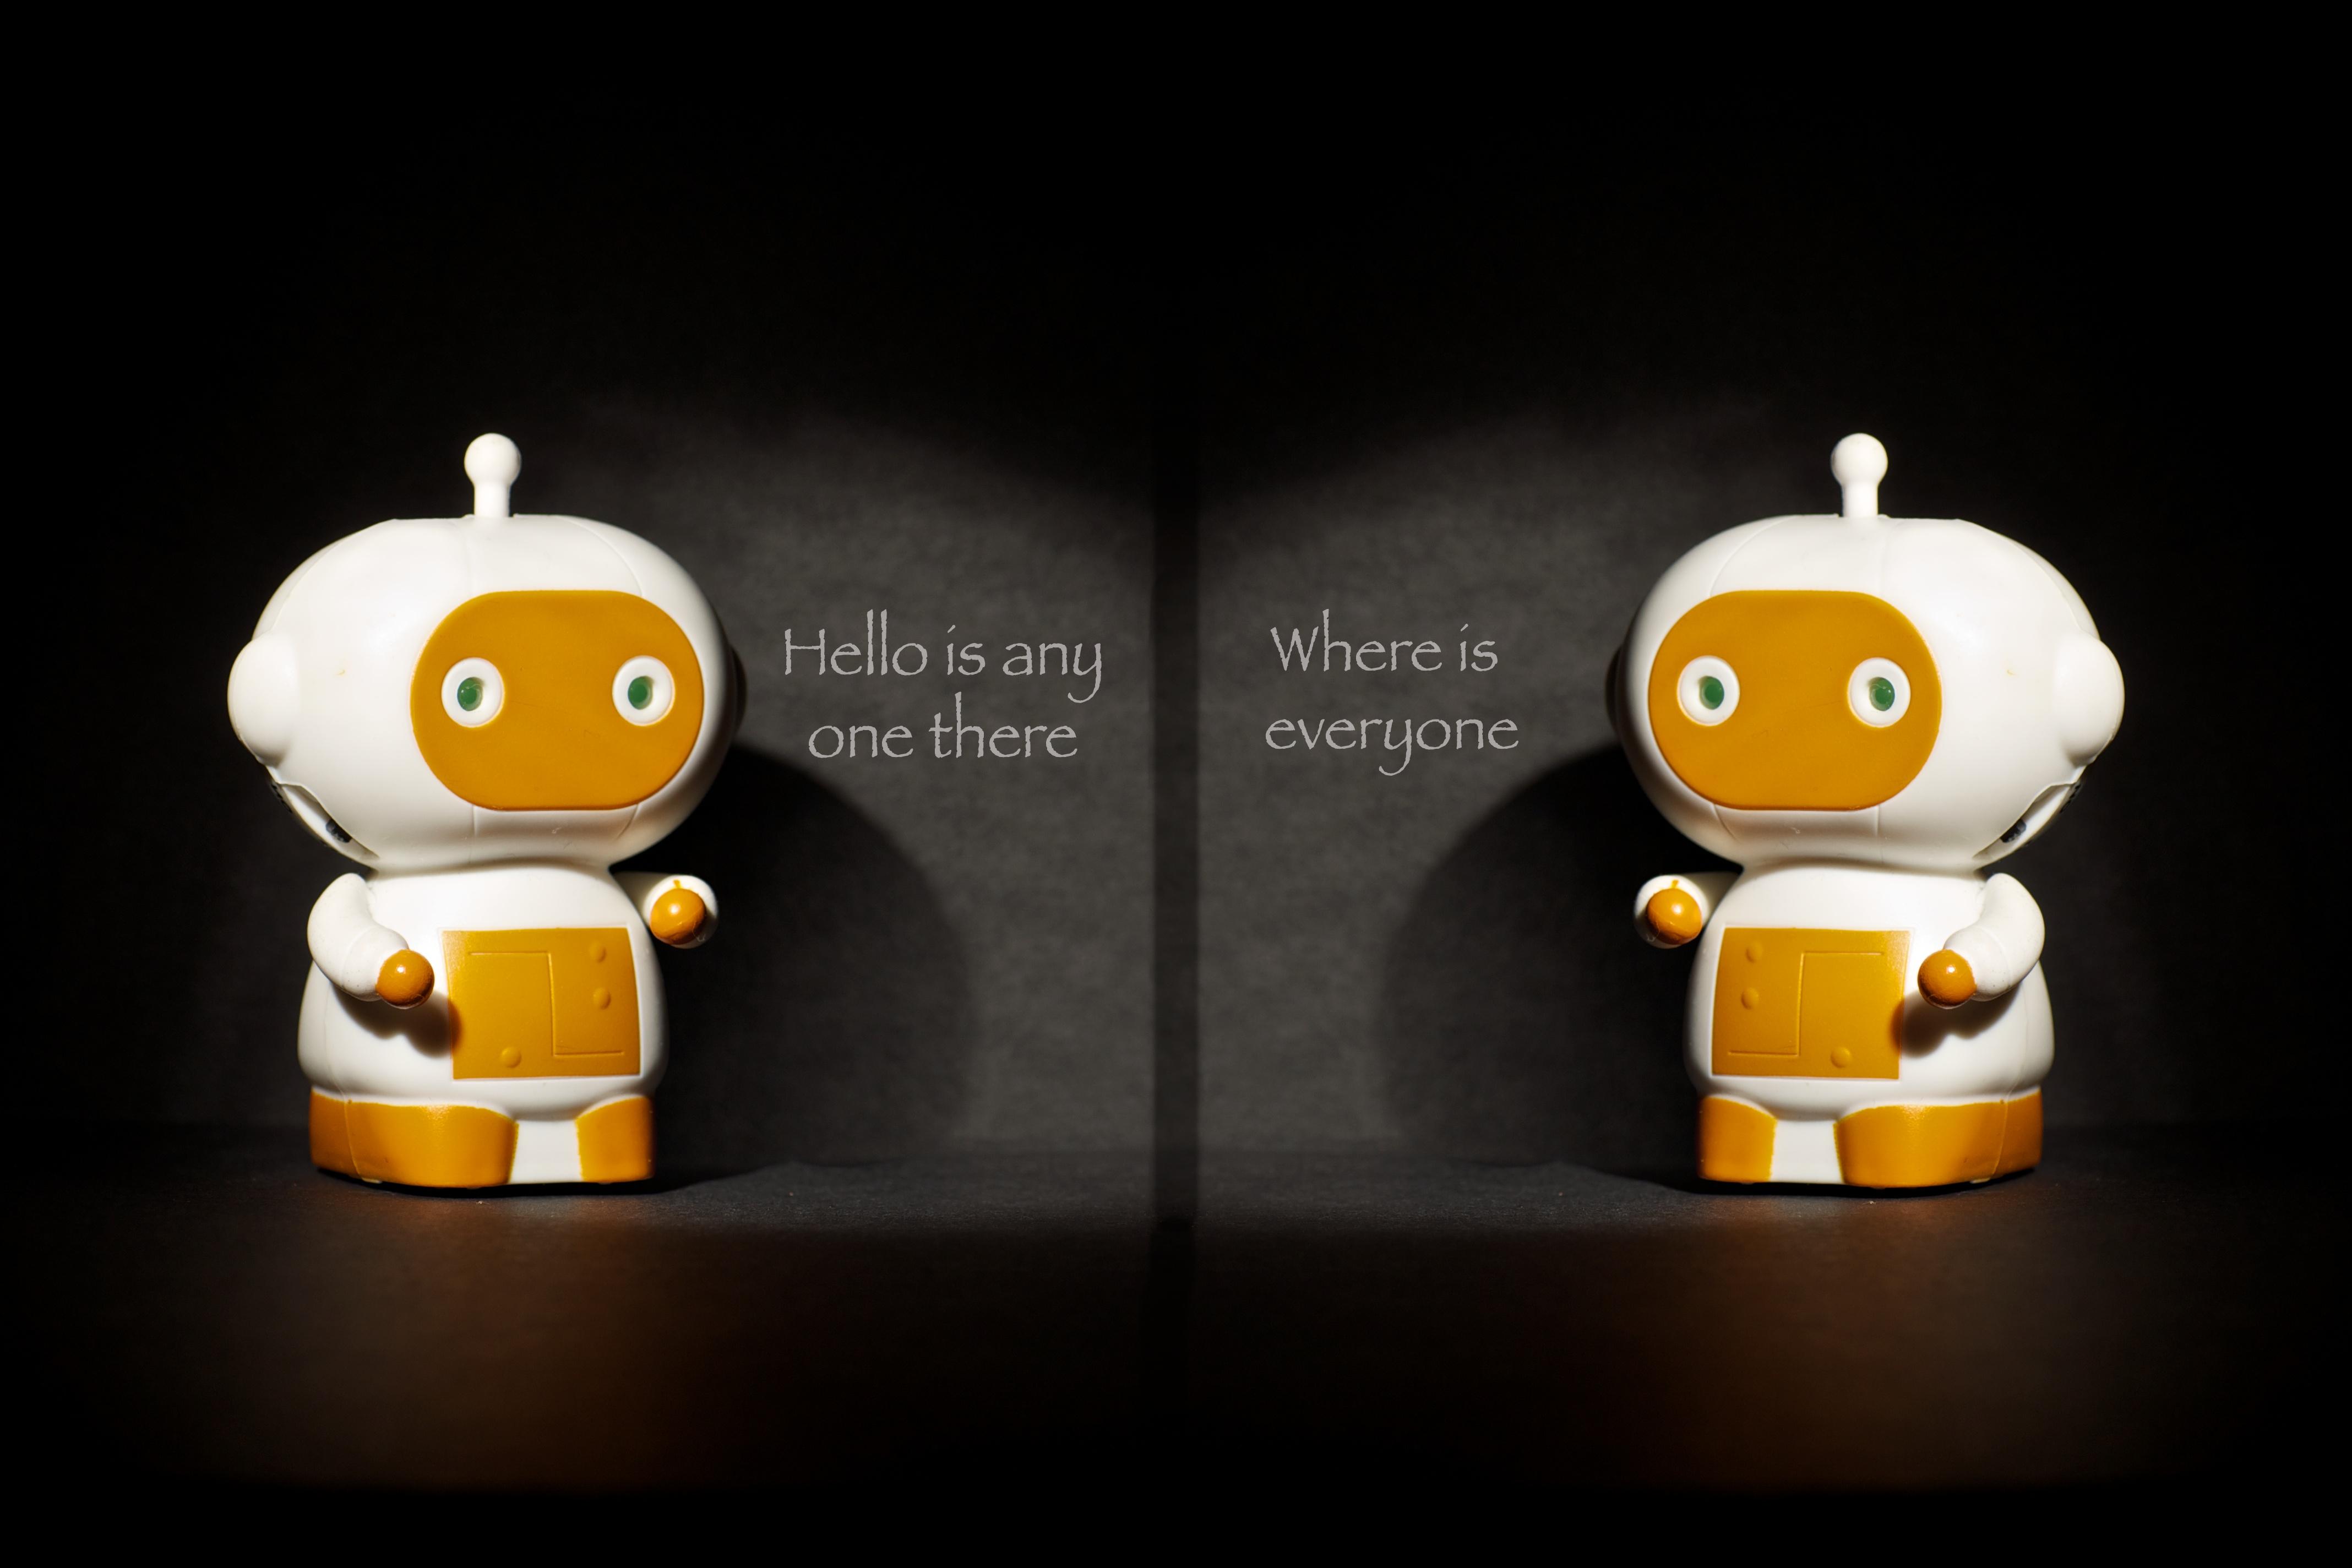 Gambar Jumlah Jeruk Hitam Kuning Penerangan Mainan Ilustrasi